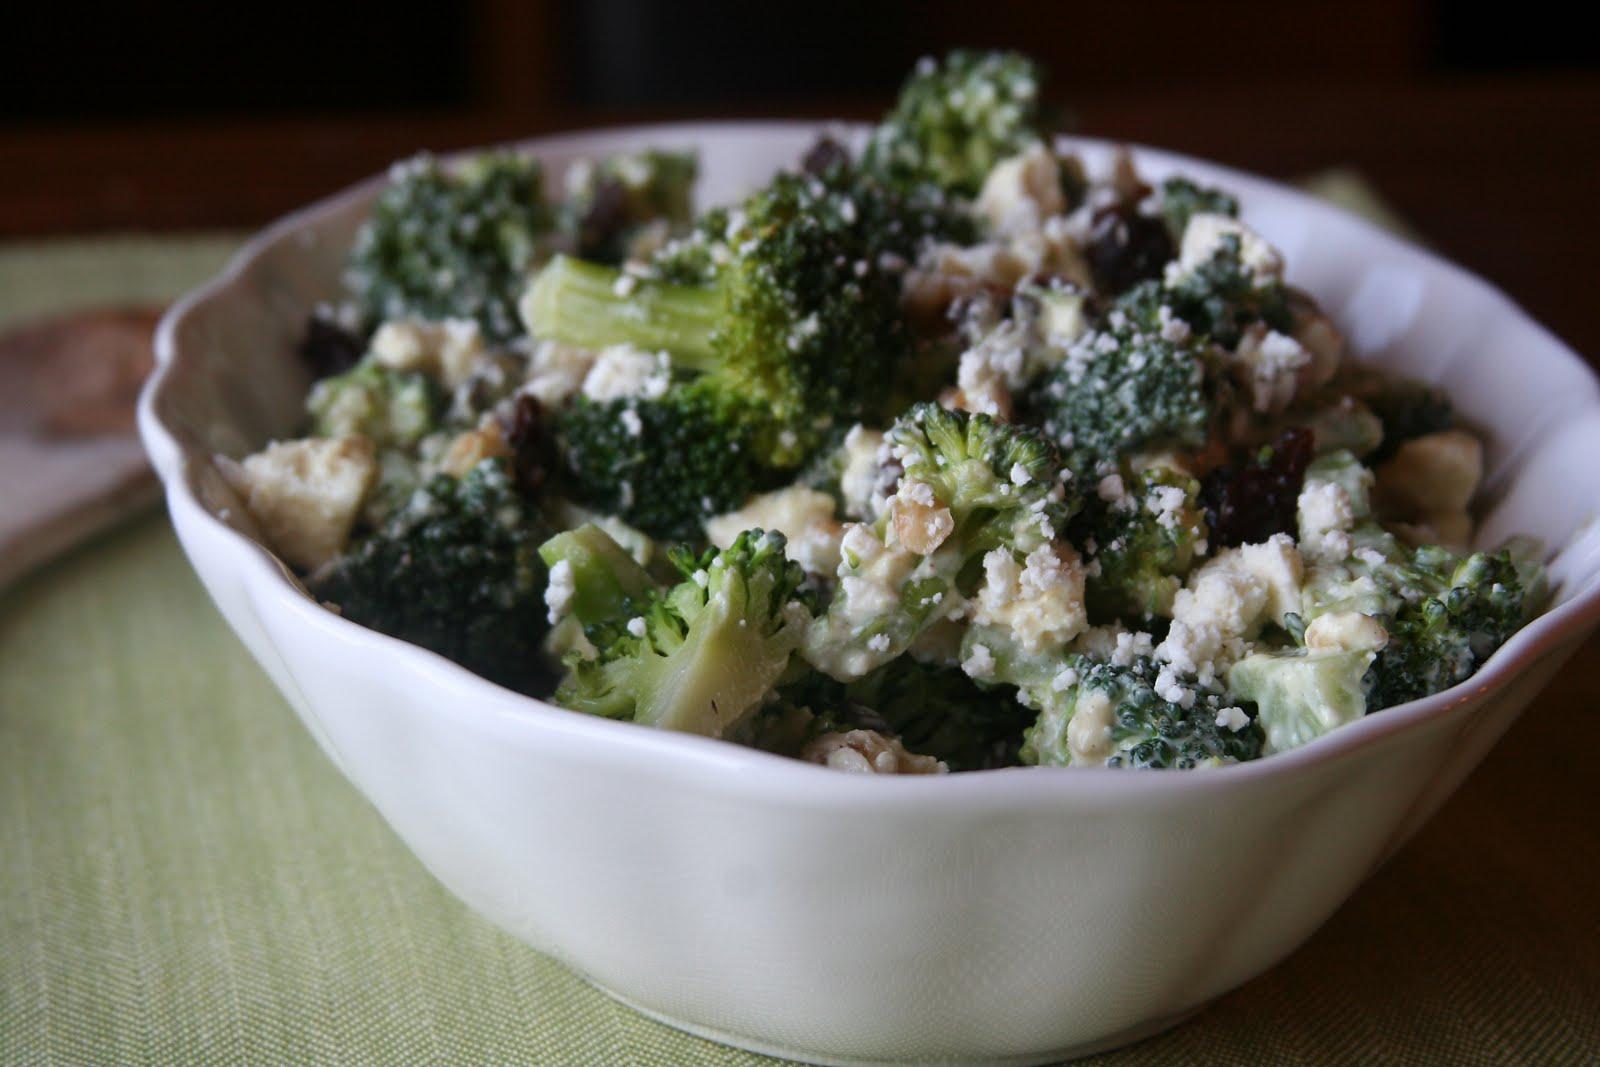 images A Lighter Broccoli Cream Soup